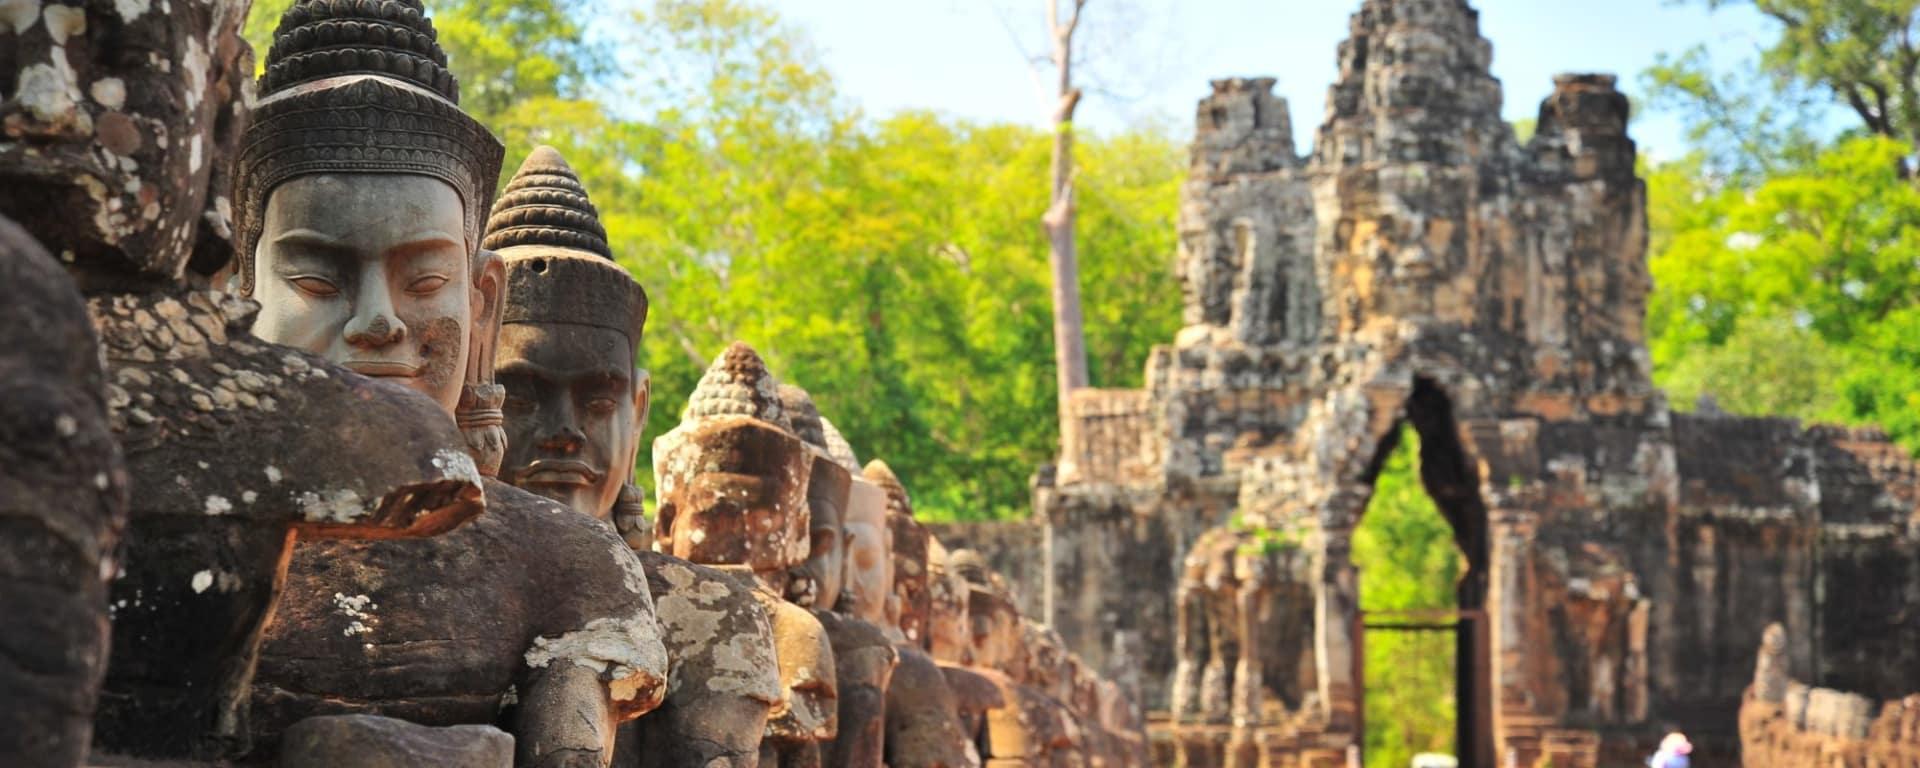 A la découverte d'Angkor à Siem Reap: Siem Reap Angkor Thom South Gate